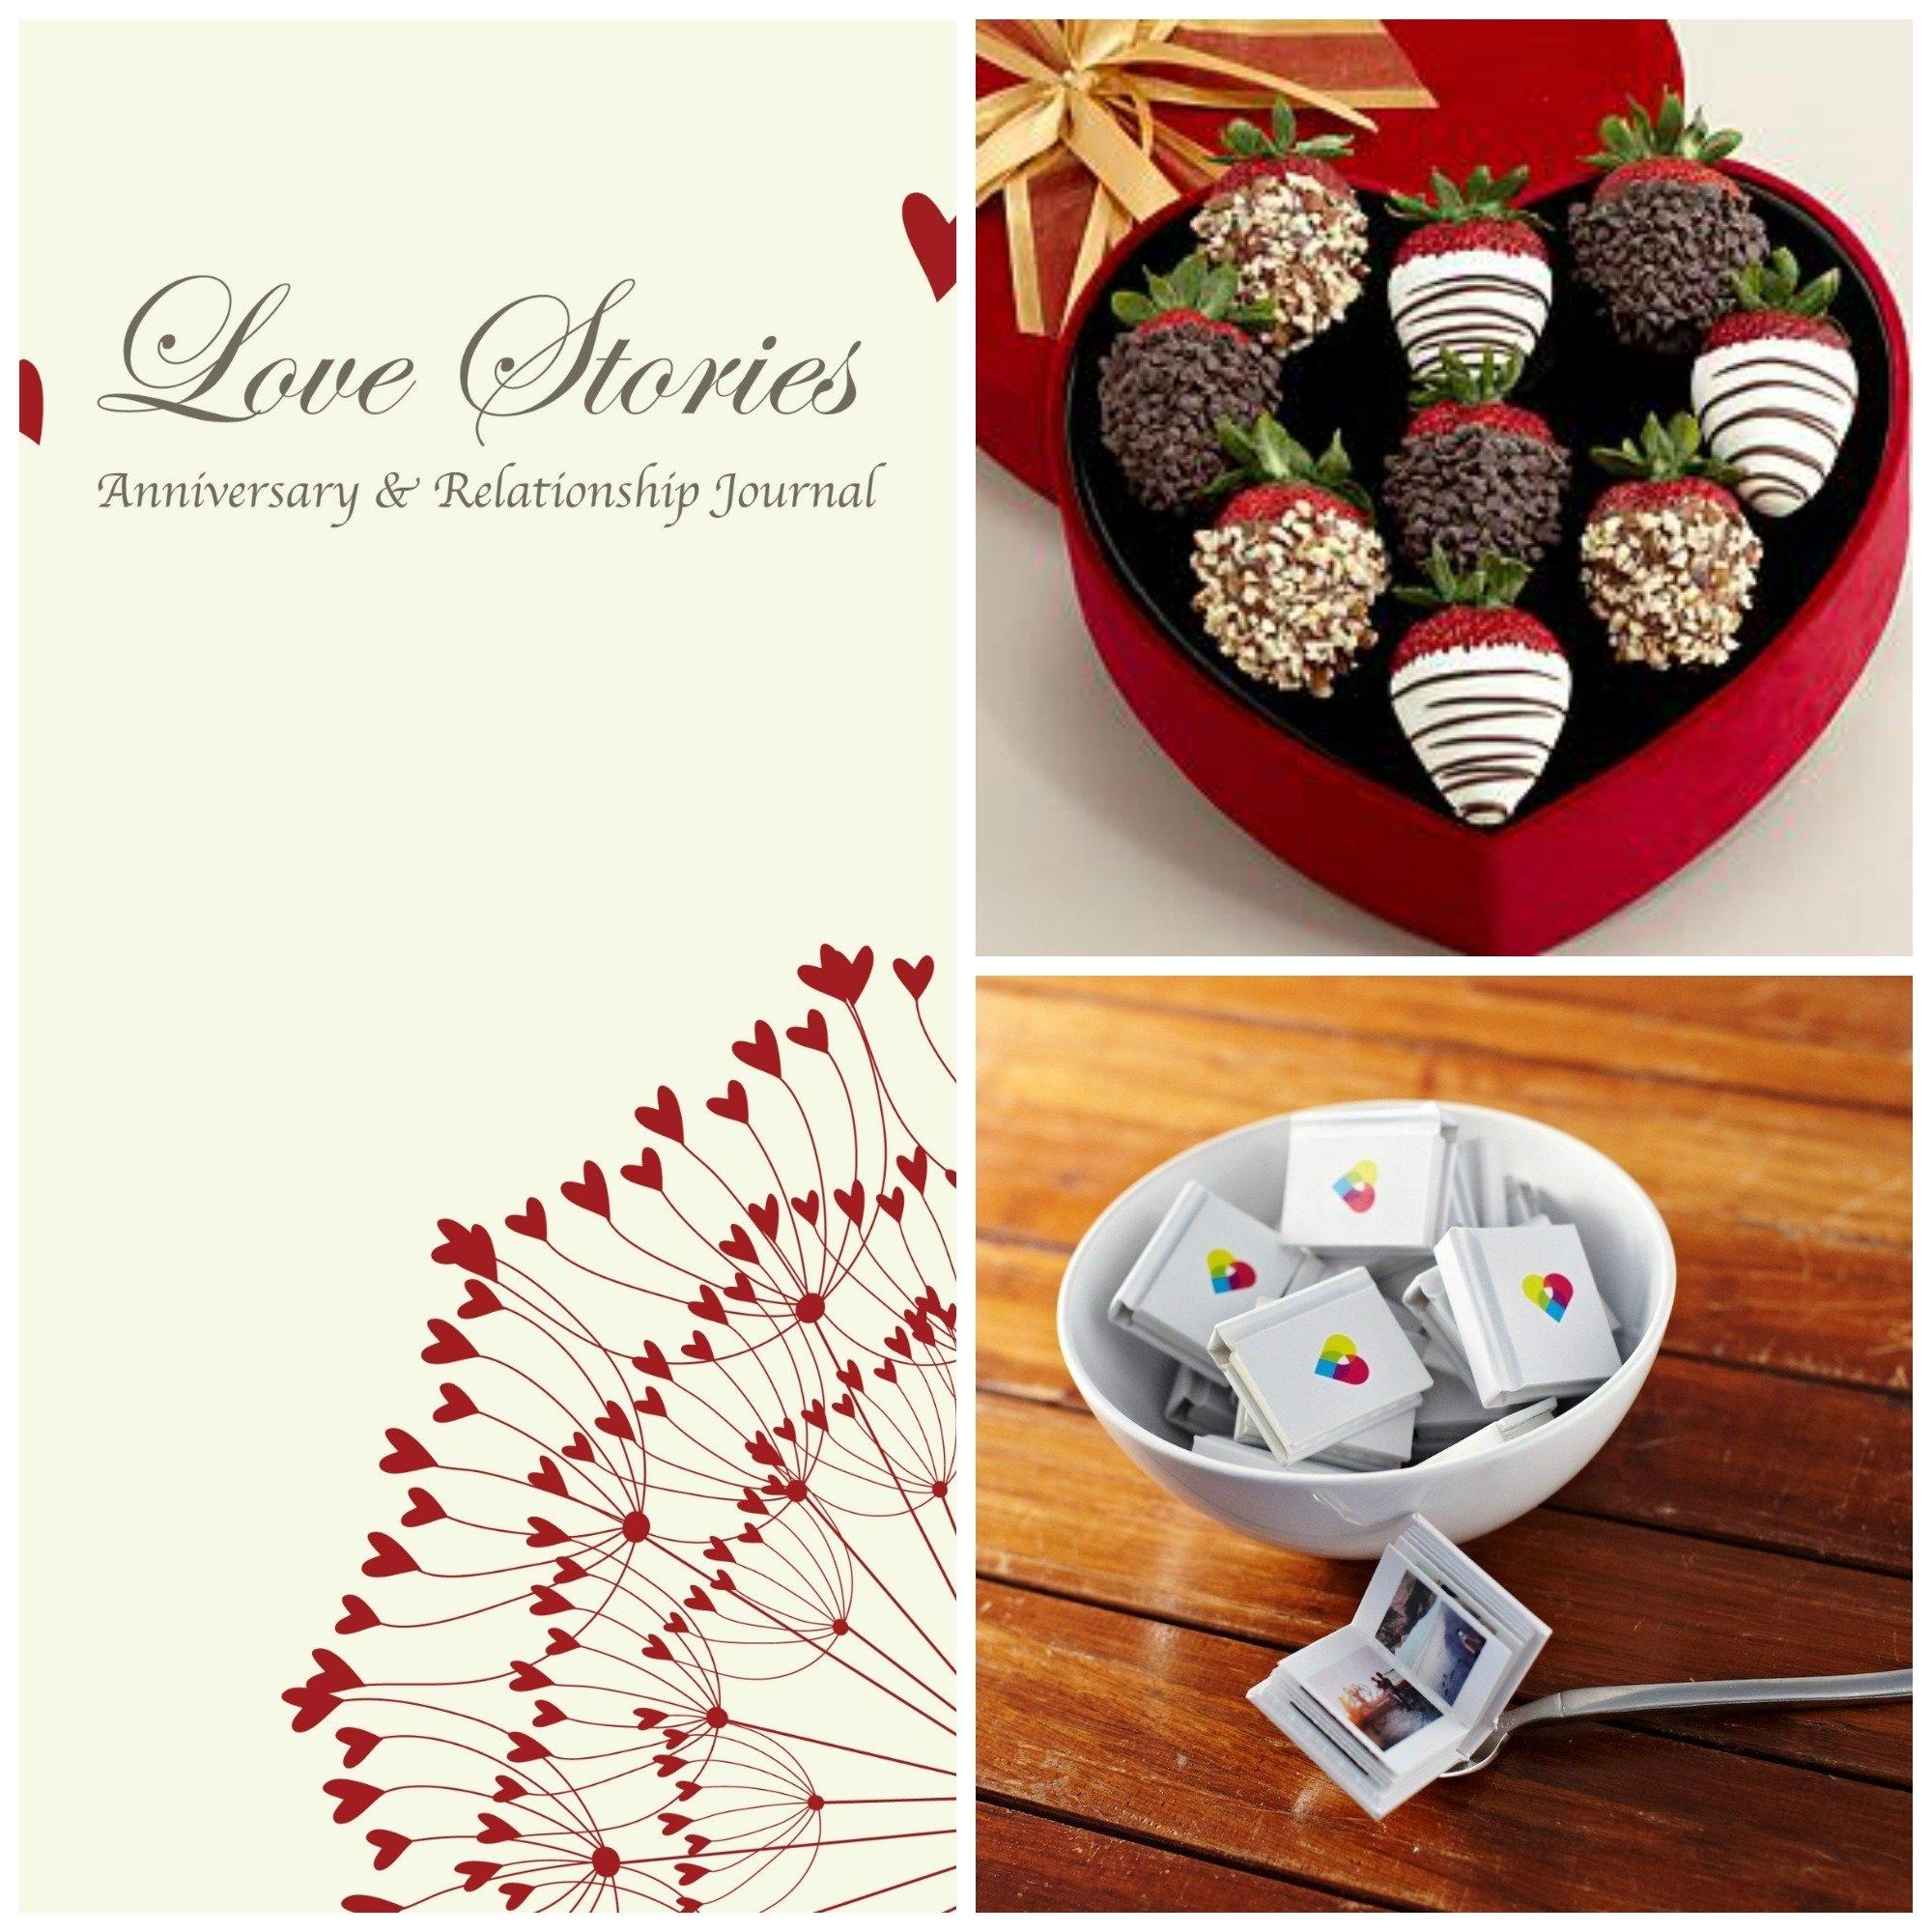 10 Attractive Romantic Birthday Gift Ideas For Him romantic gift ideas for him 9